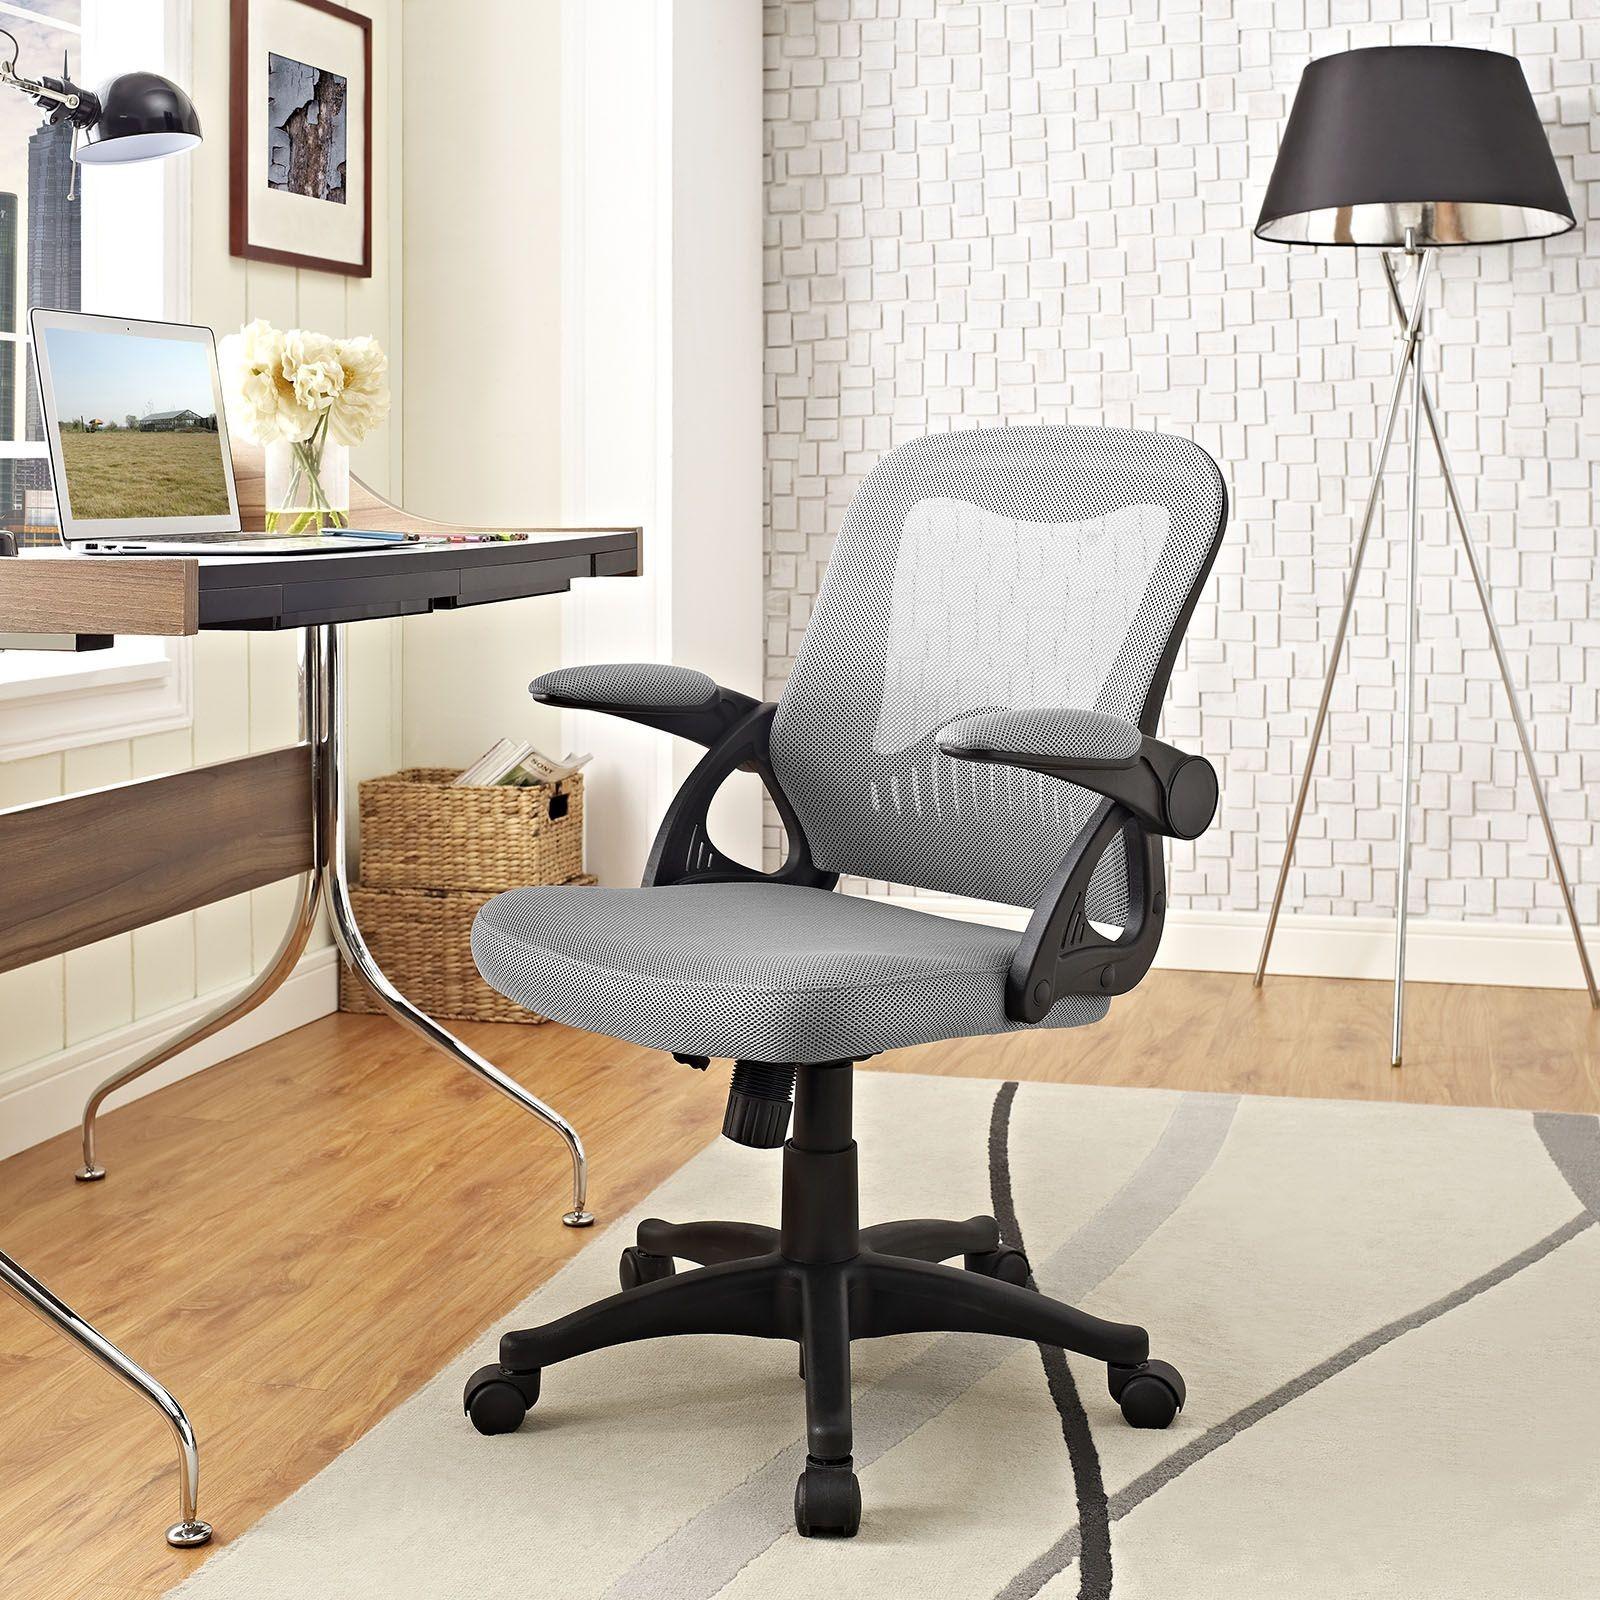 Advance Gray fice Chair EEI 2155 GRY Renegade Furniture